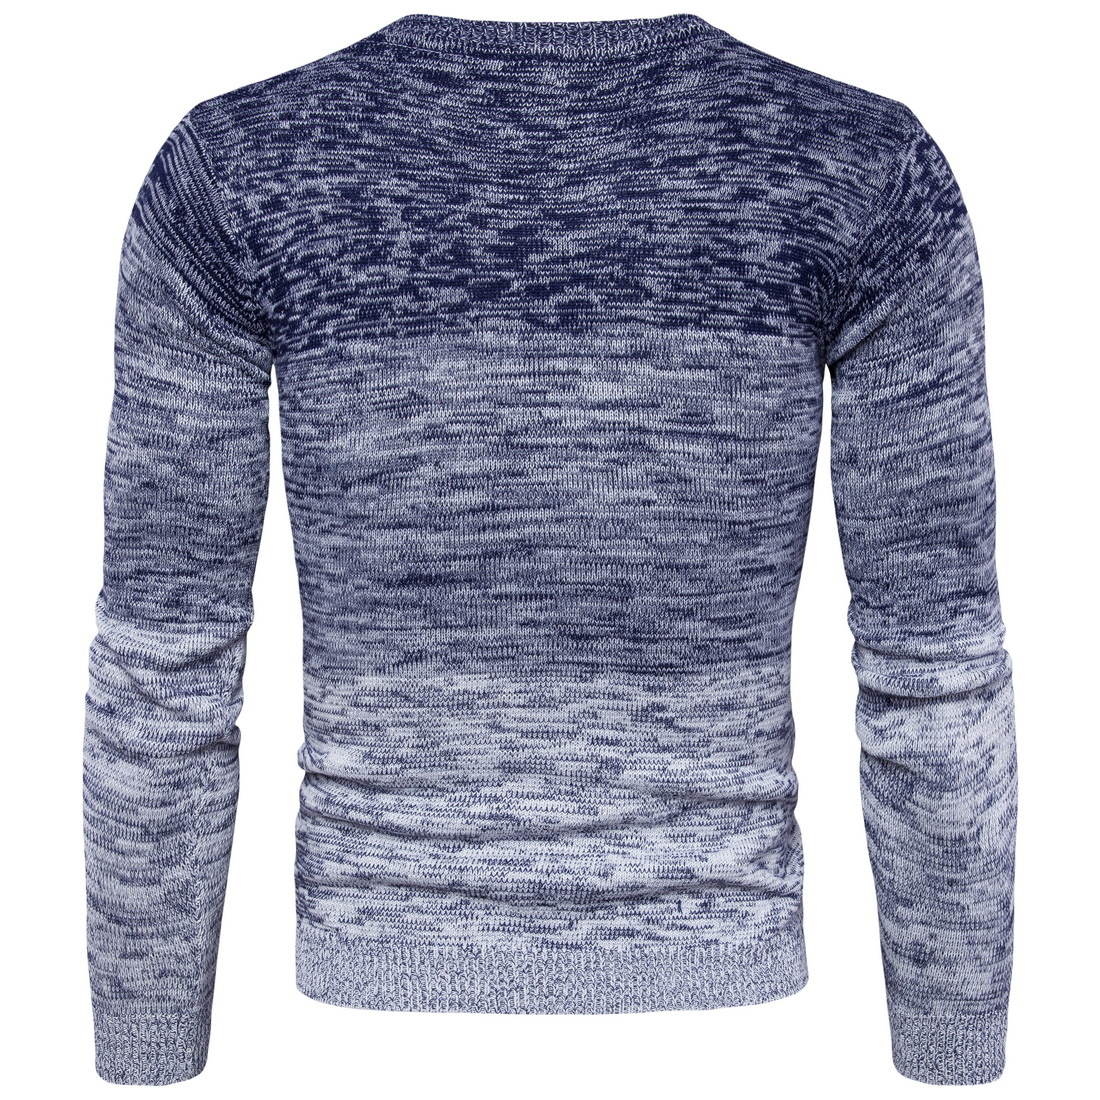 para homem casaco camisola masculina q6263